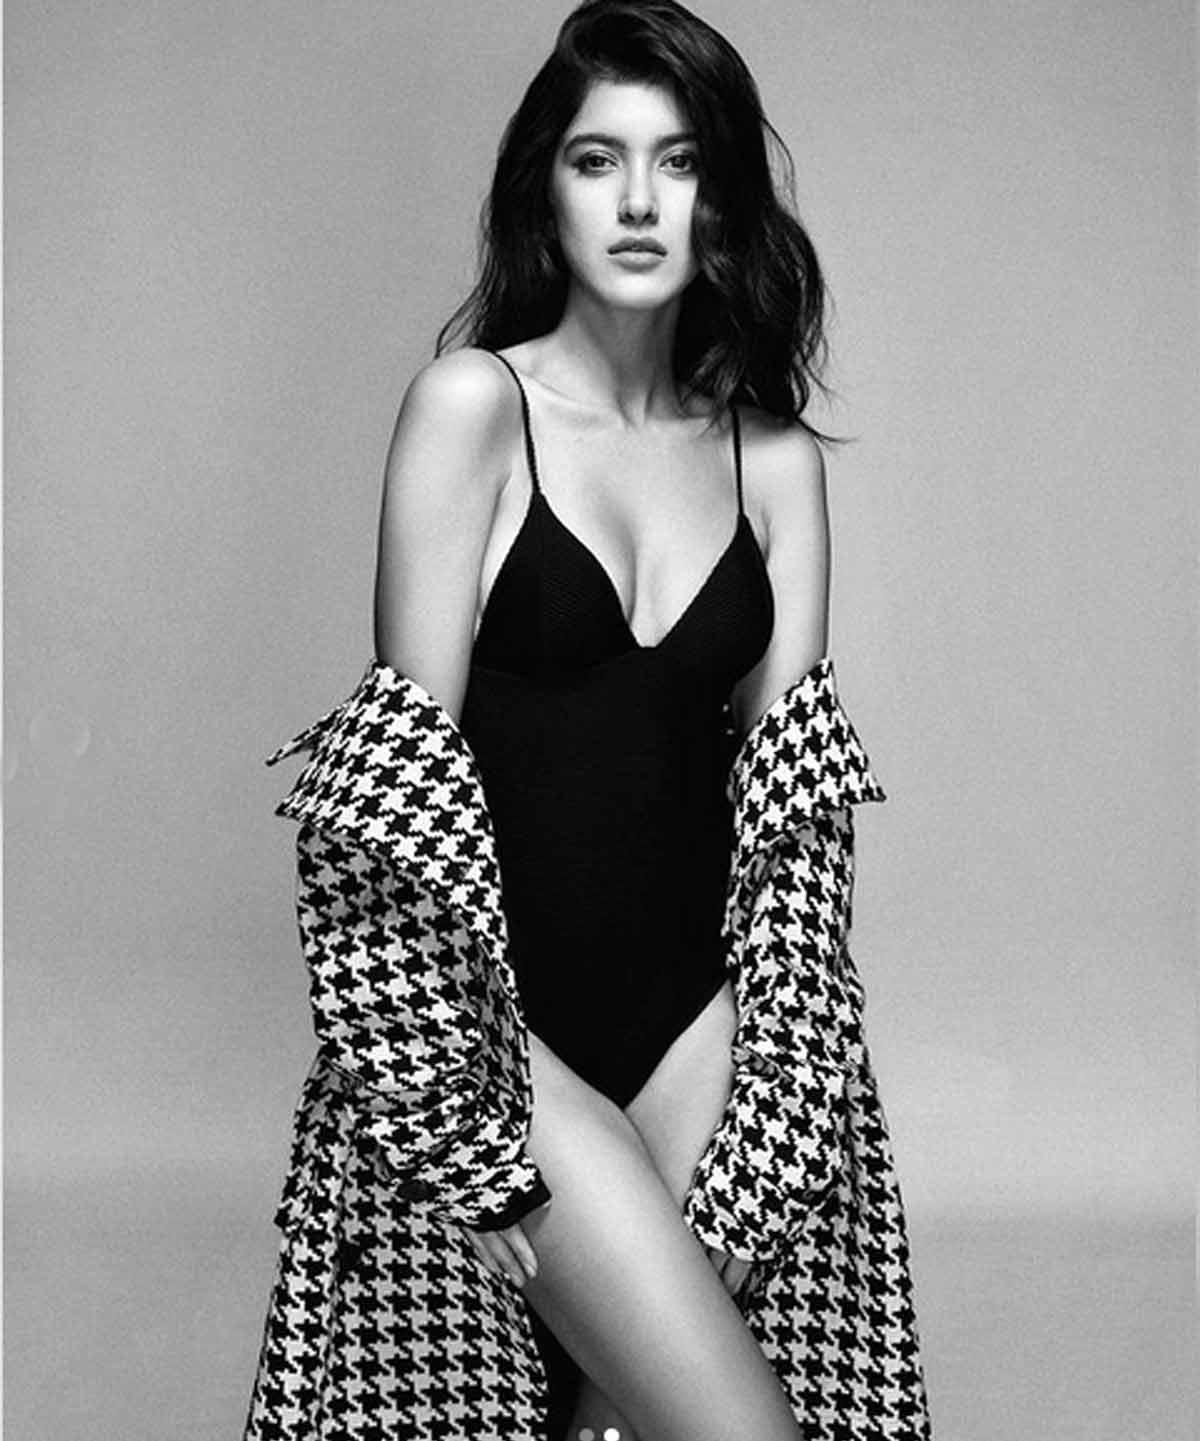 Pic Talk: Shanaya Kapoor looks scintillating in monokini